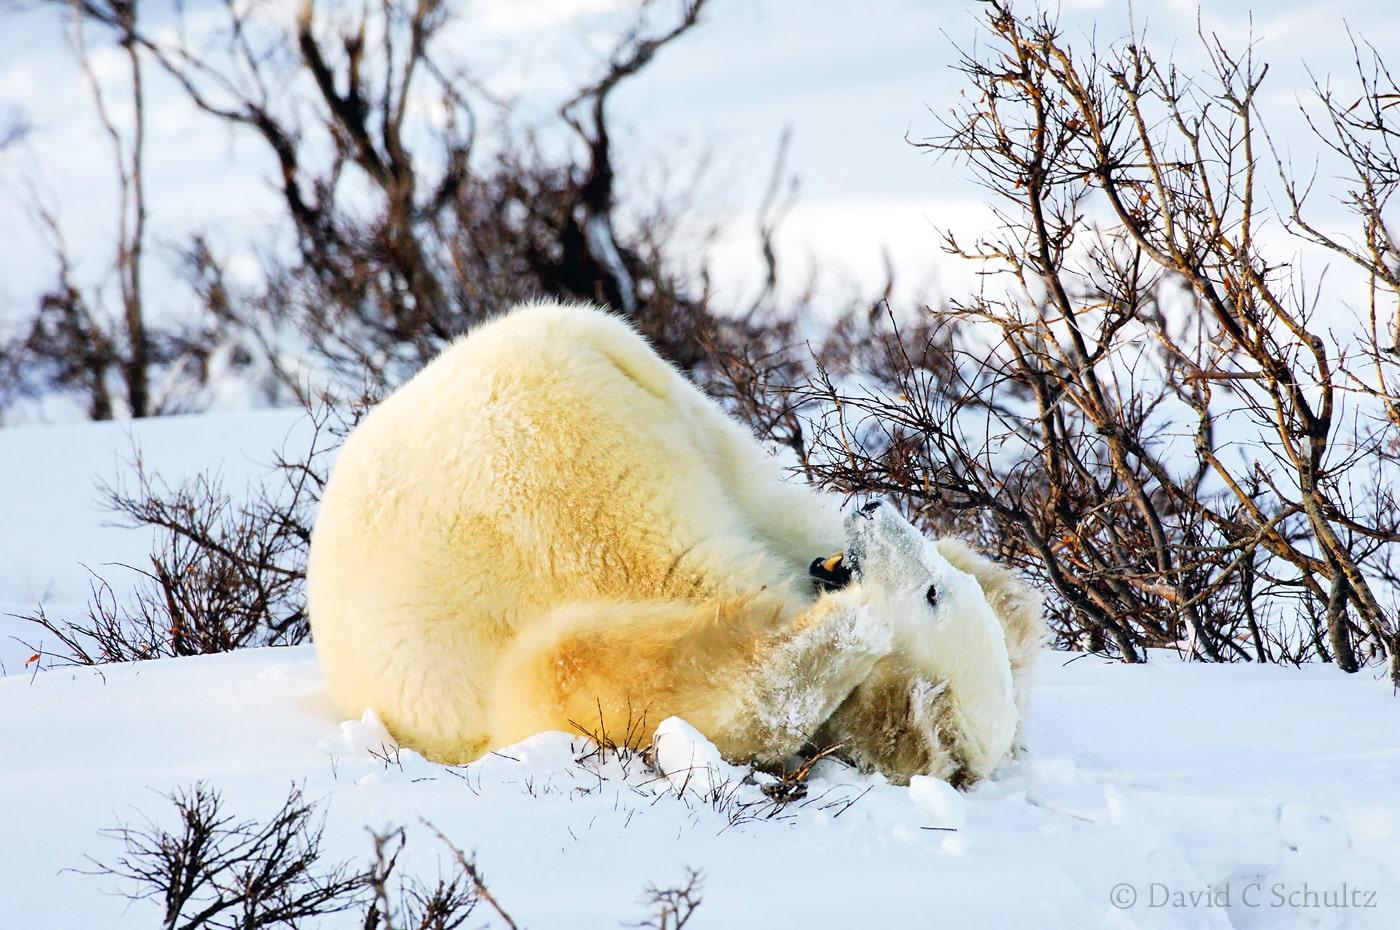 Polar bear, Canada - Image #168-513